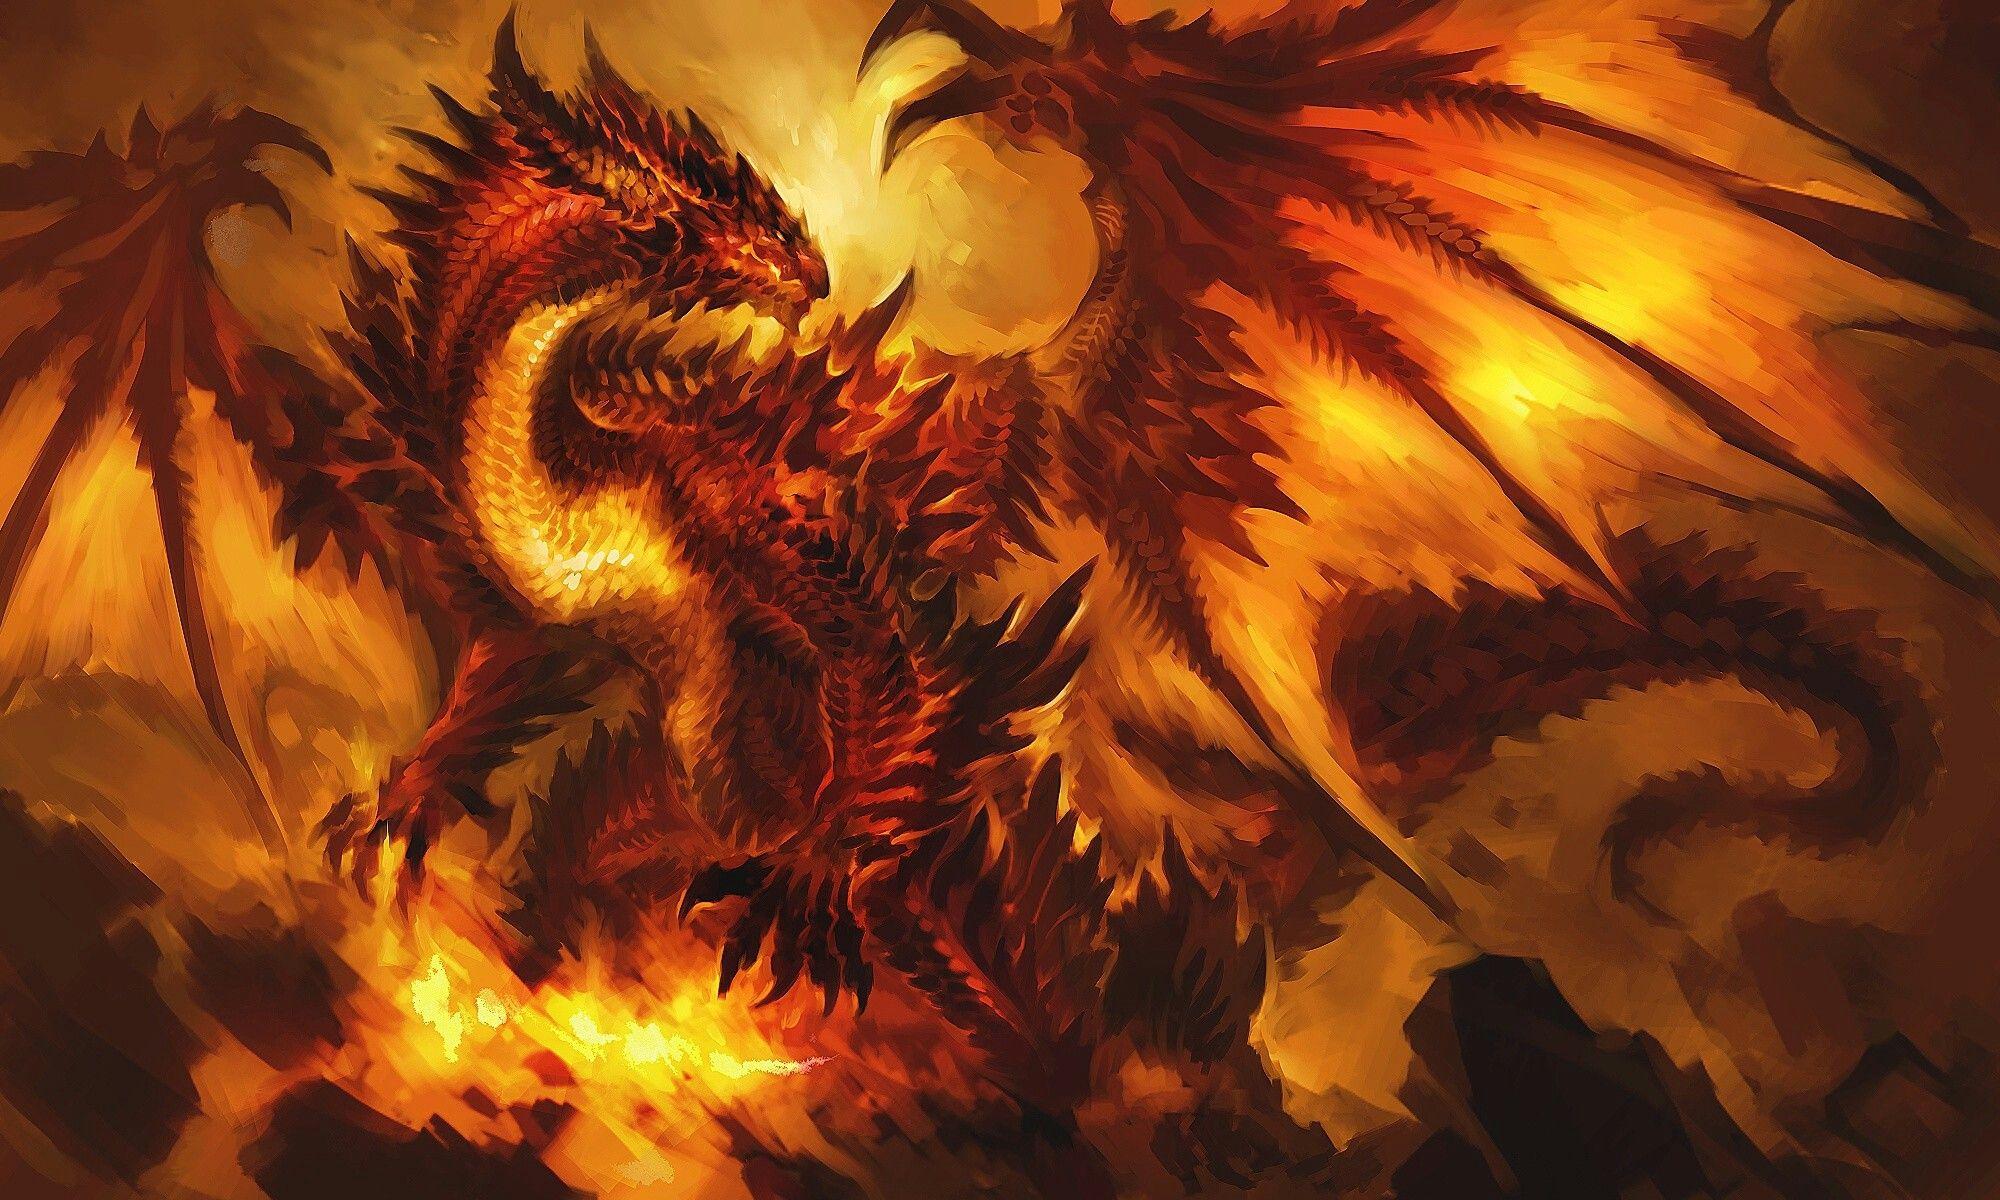 картинки огневого дракона